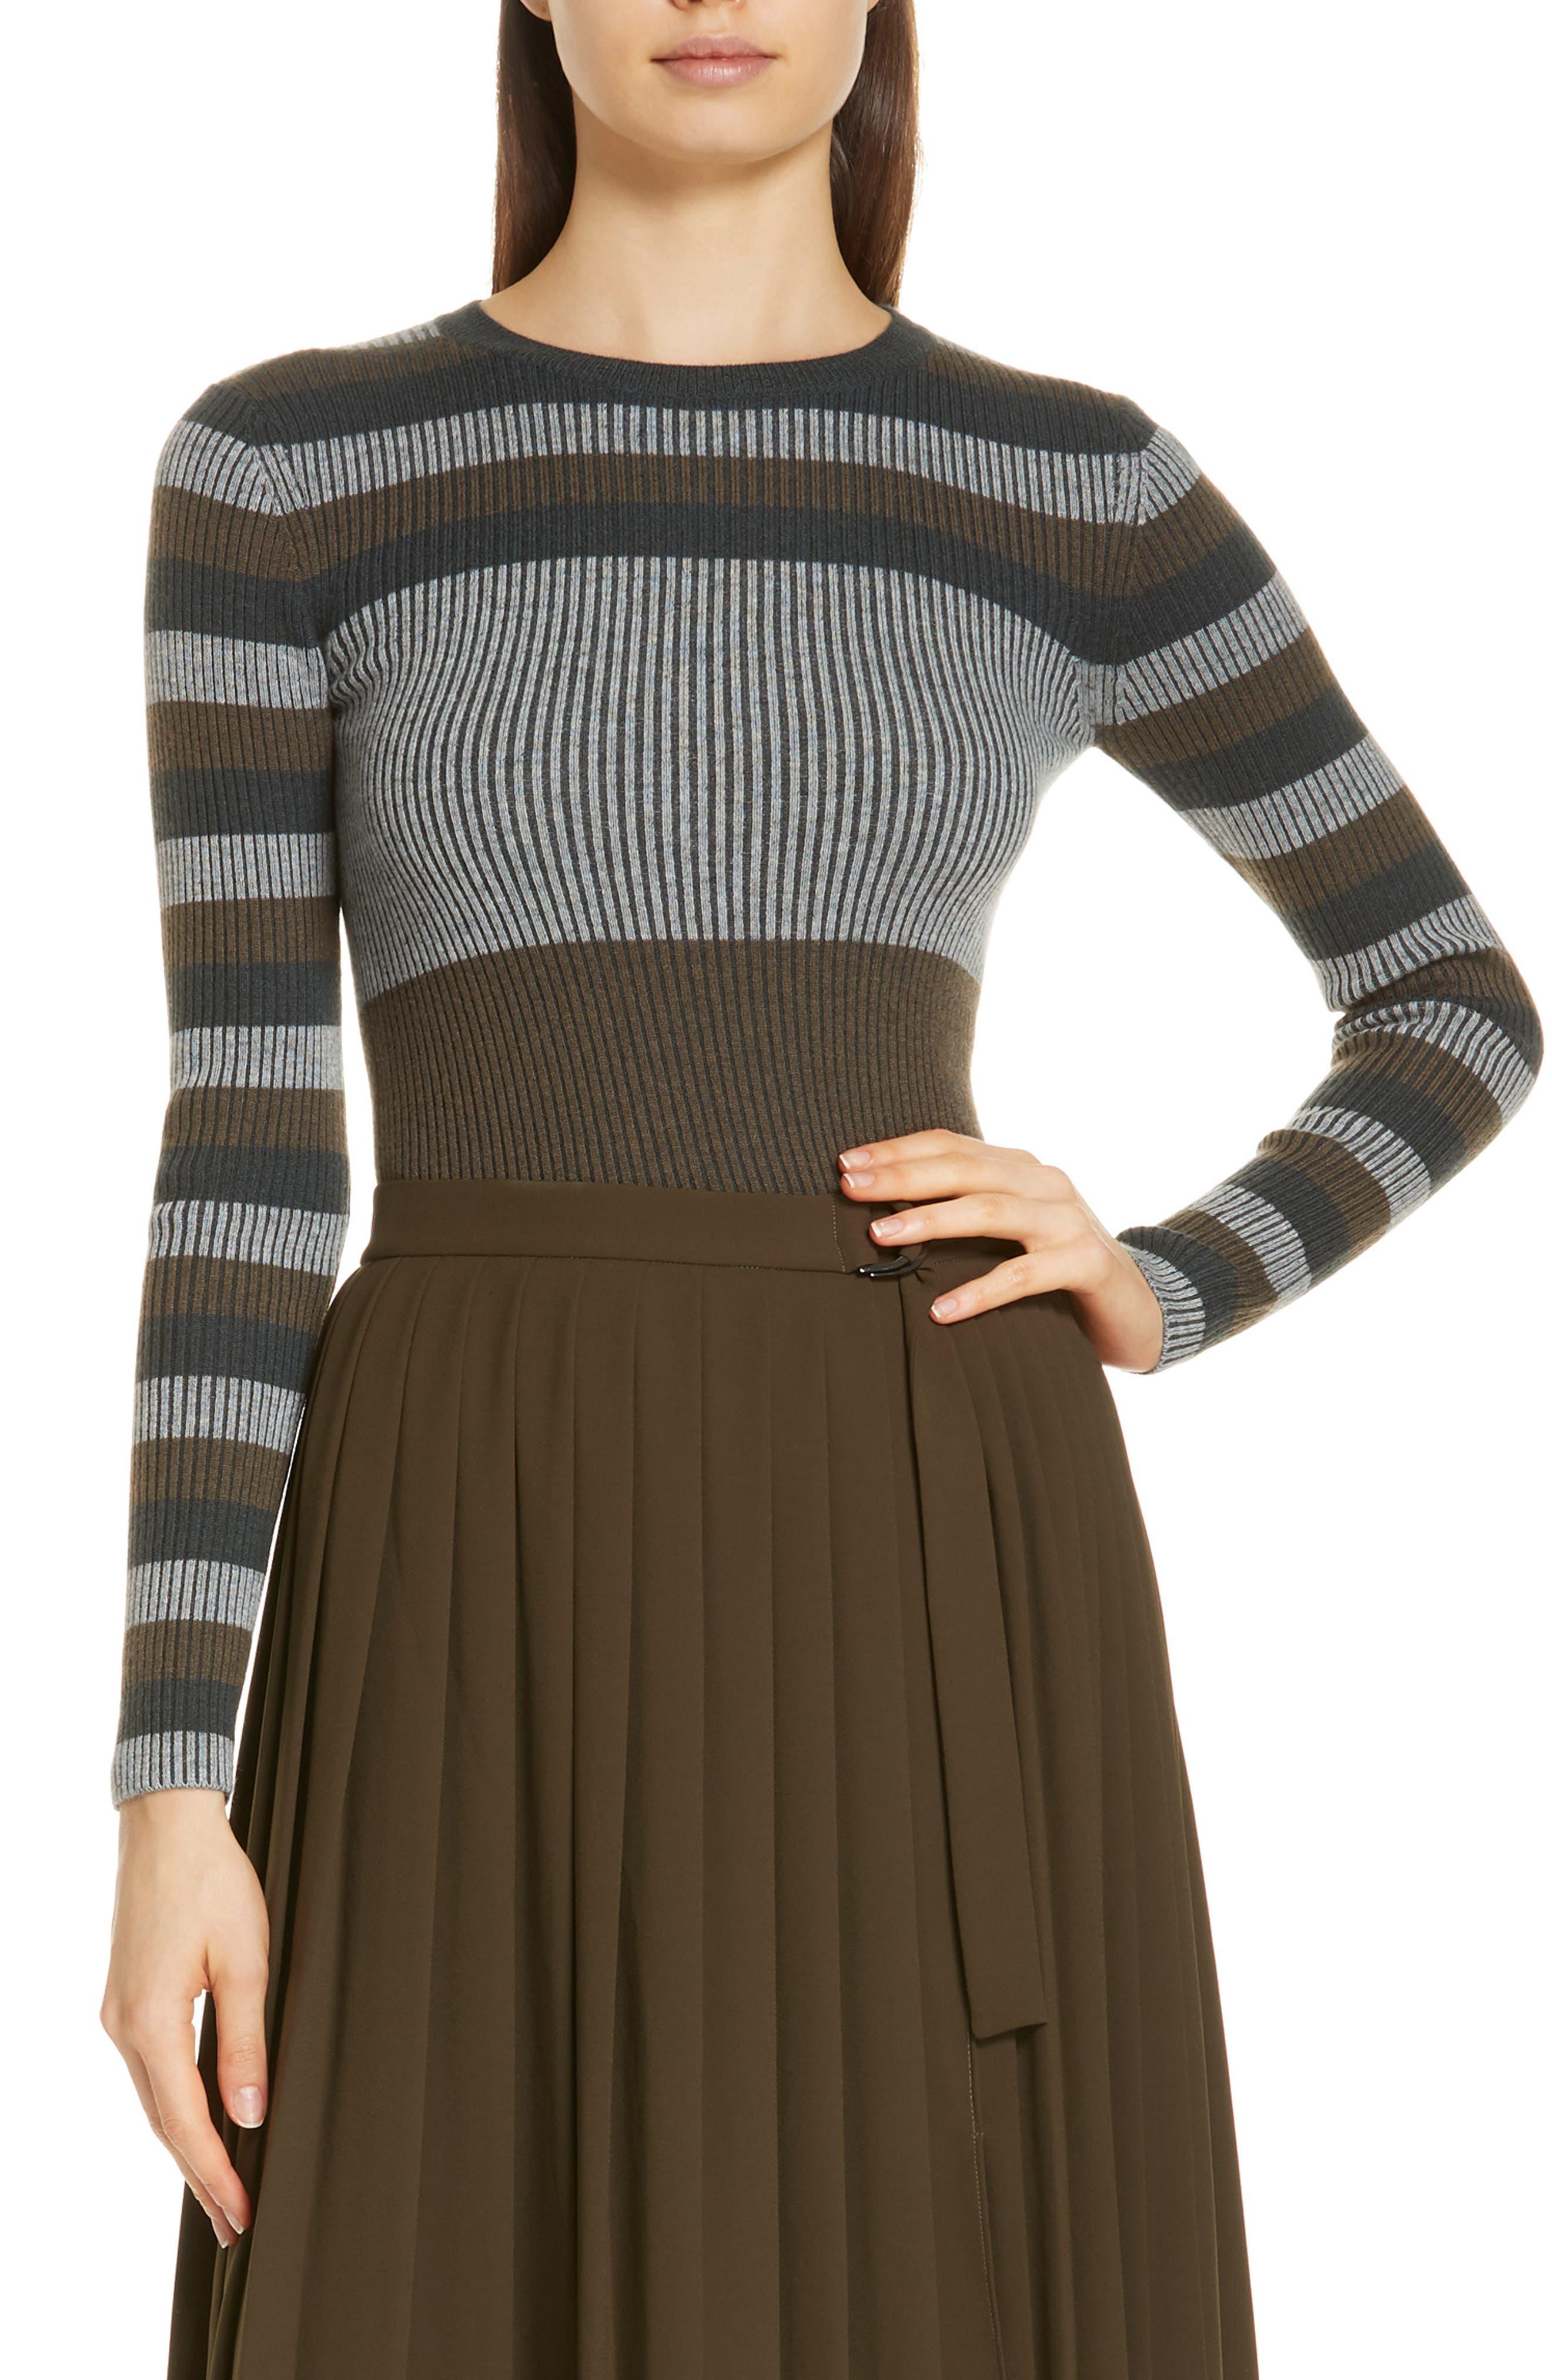 NORDSTROM SIGNATURE,                             Stripe Cashmere Sweater,                             Main thumbnail 1, color,                             315